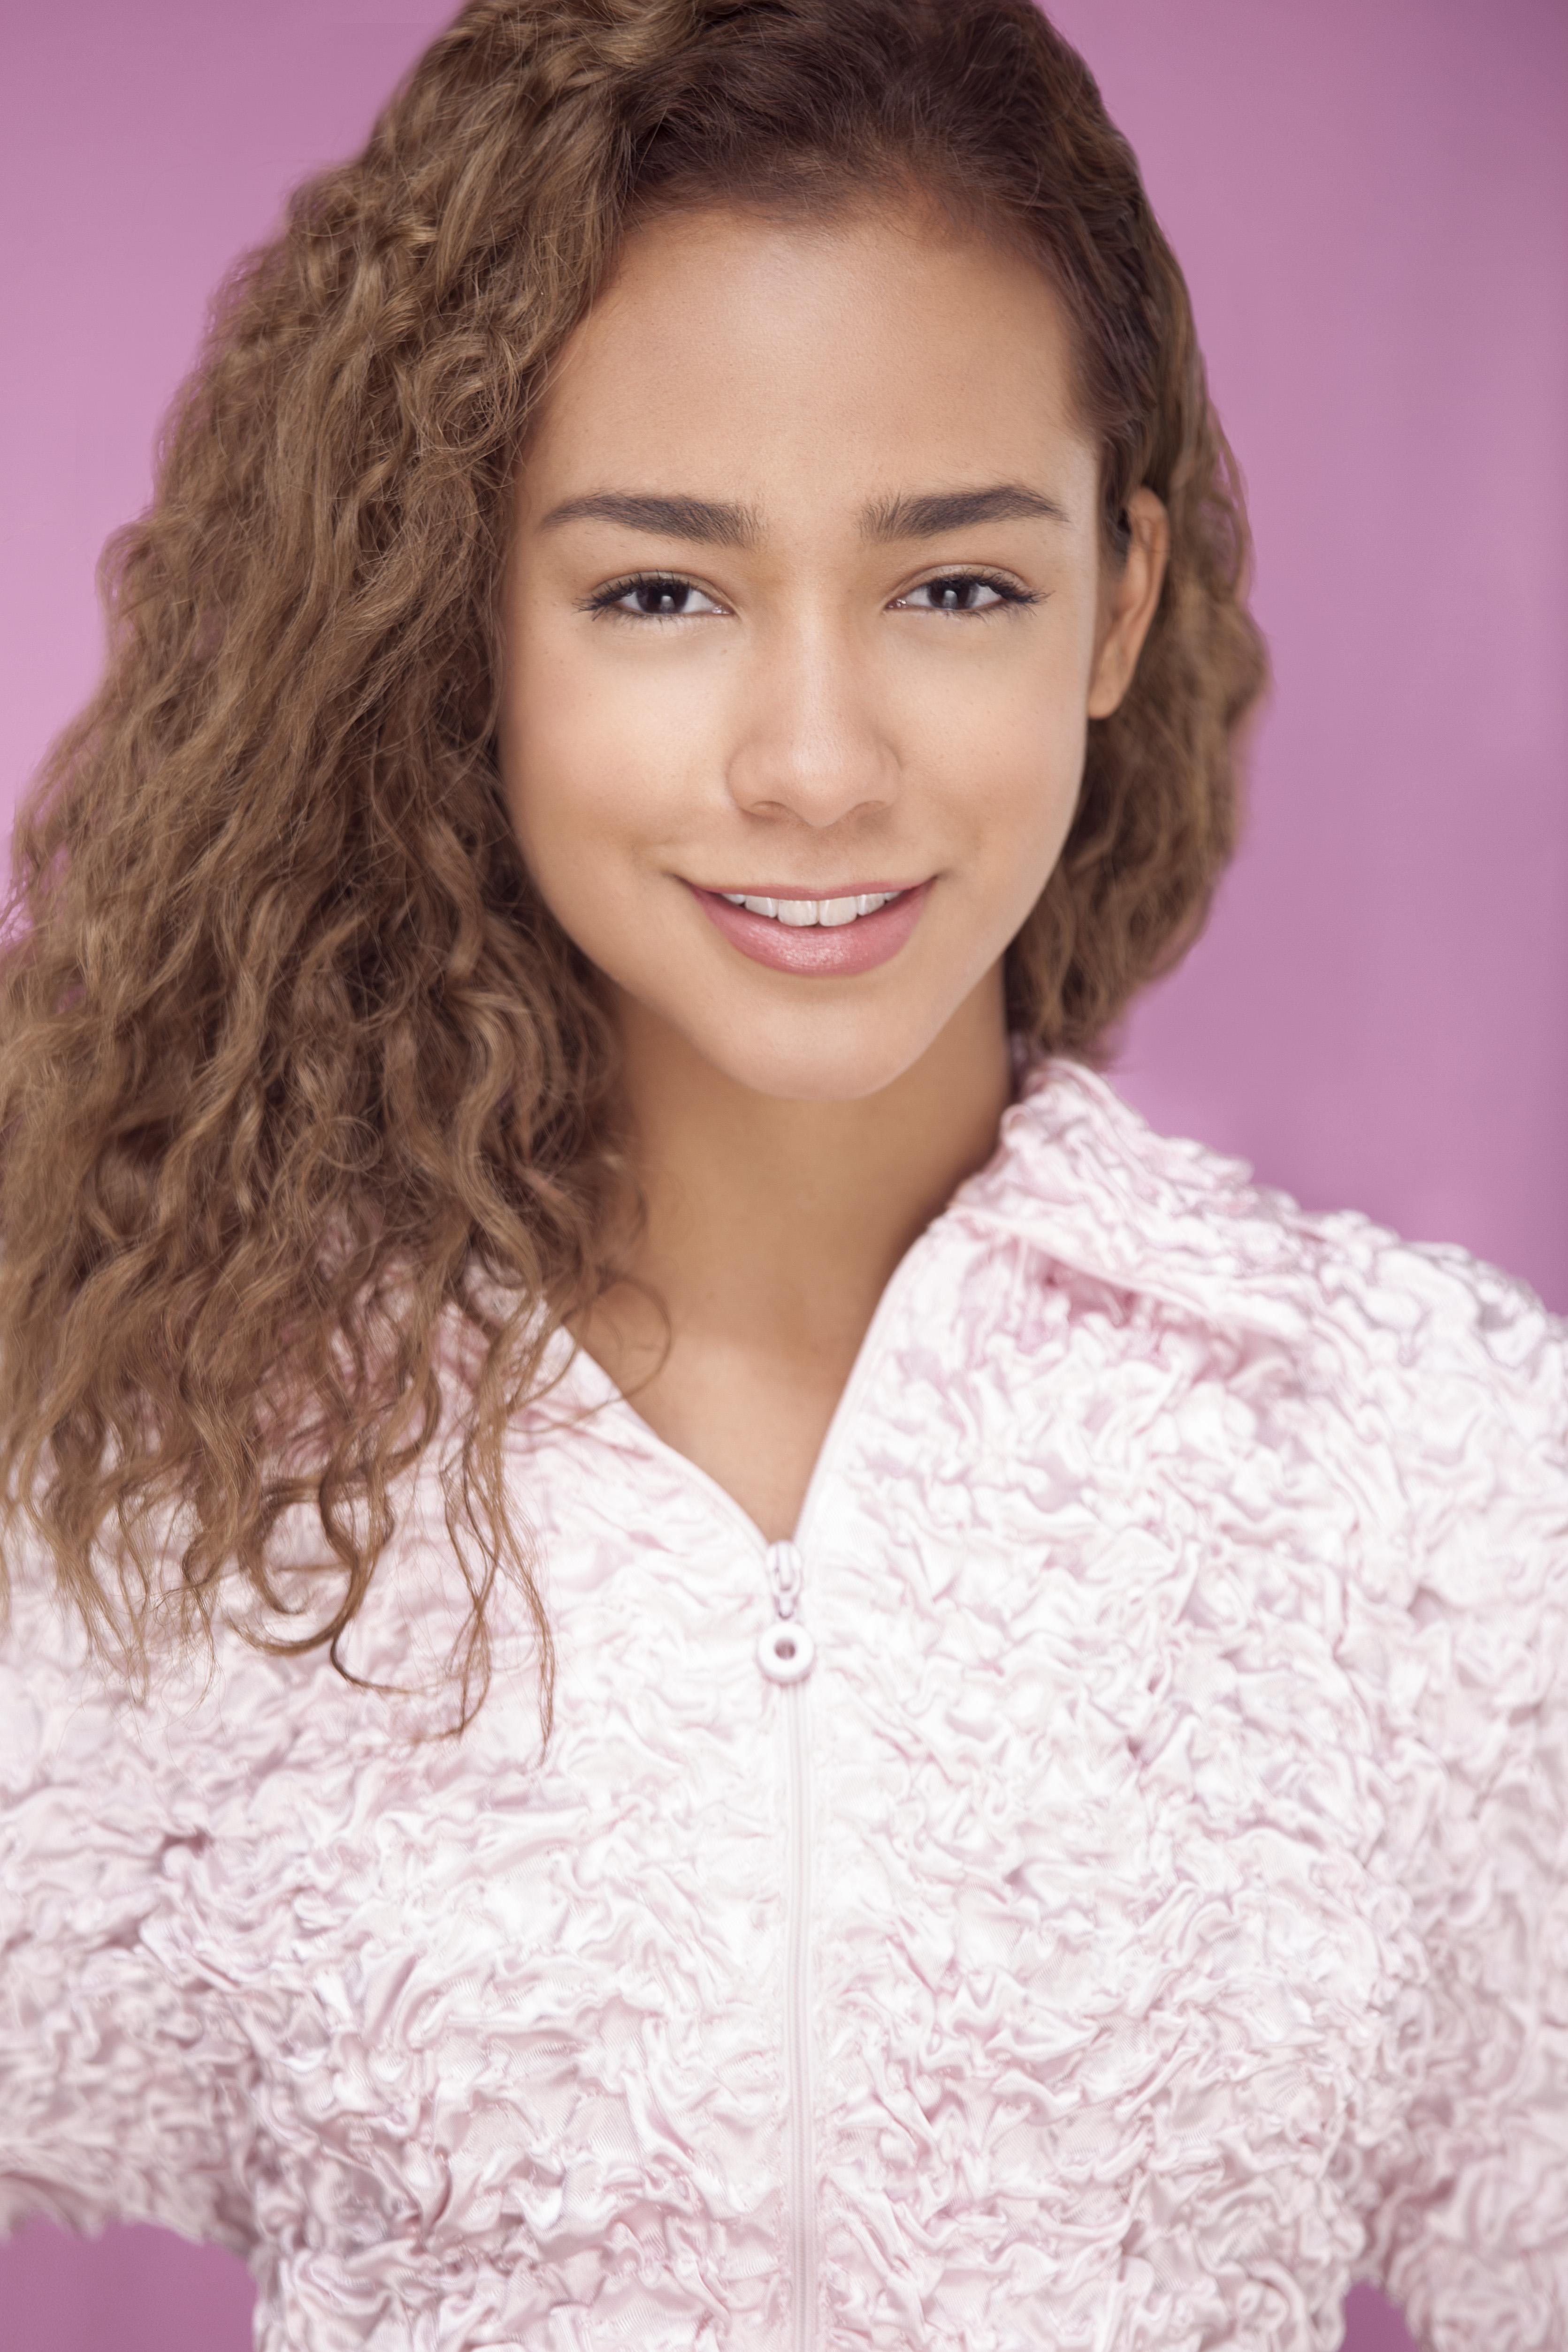 Andrea Vidal